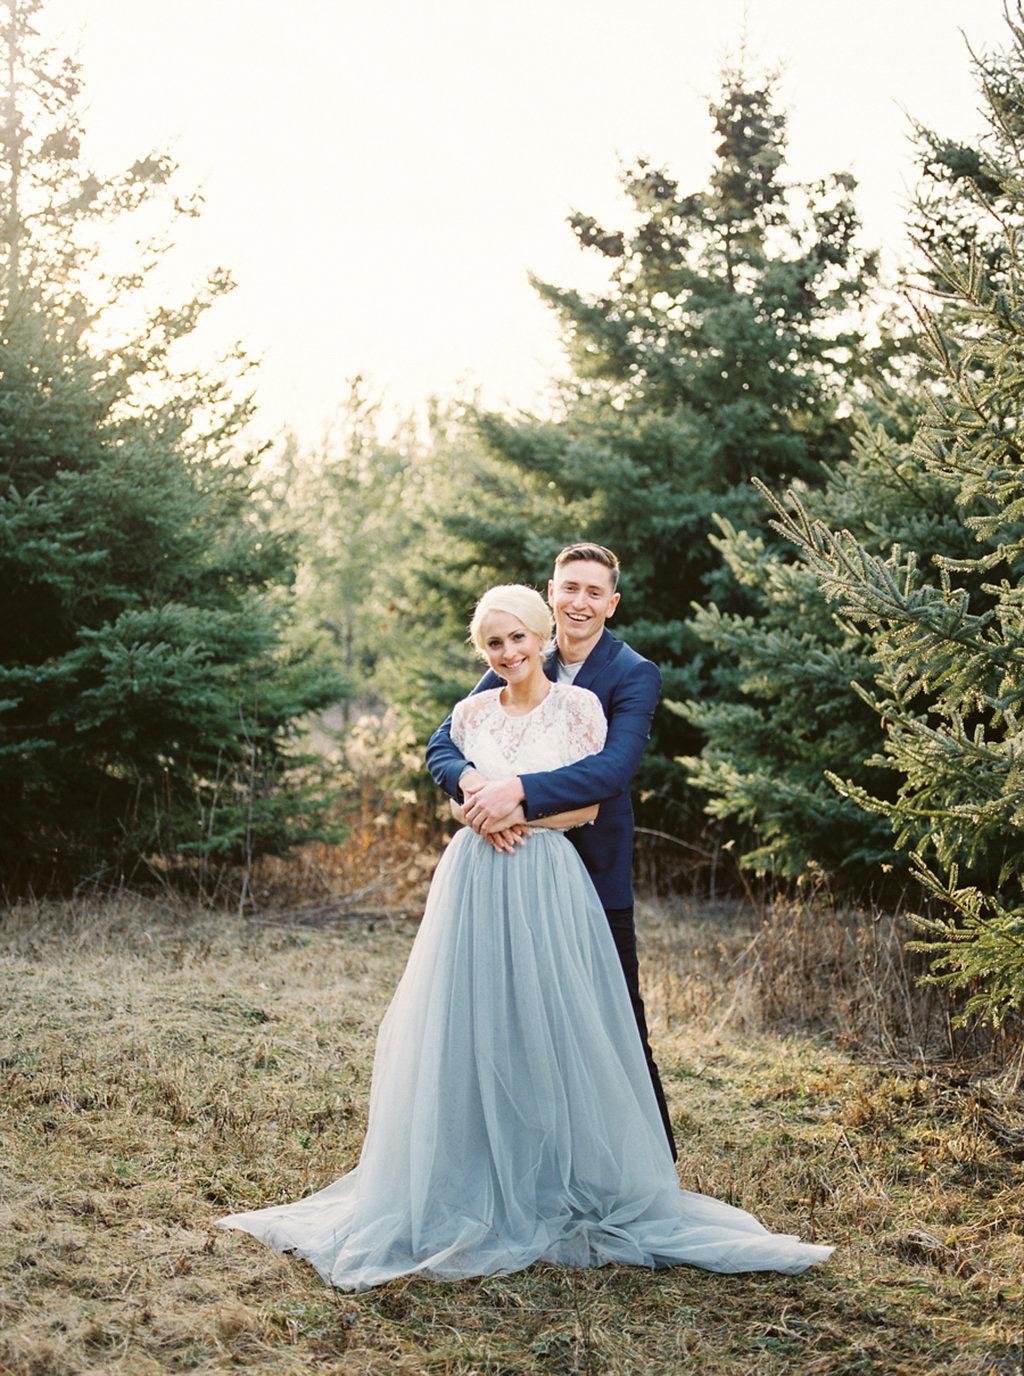 kayla-yestal-photography-vineyard-bride-swish-list-beamer-falls-manor-grimsby-engagement-21.jpg